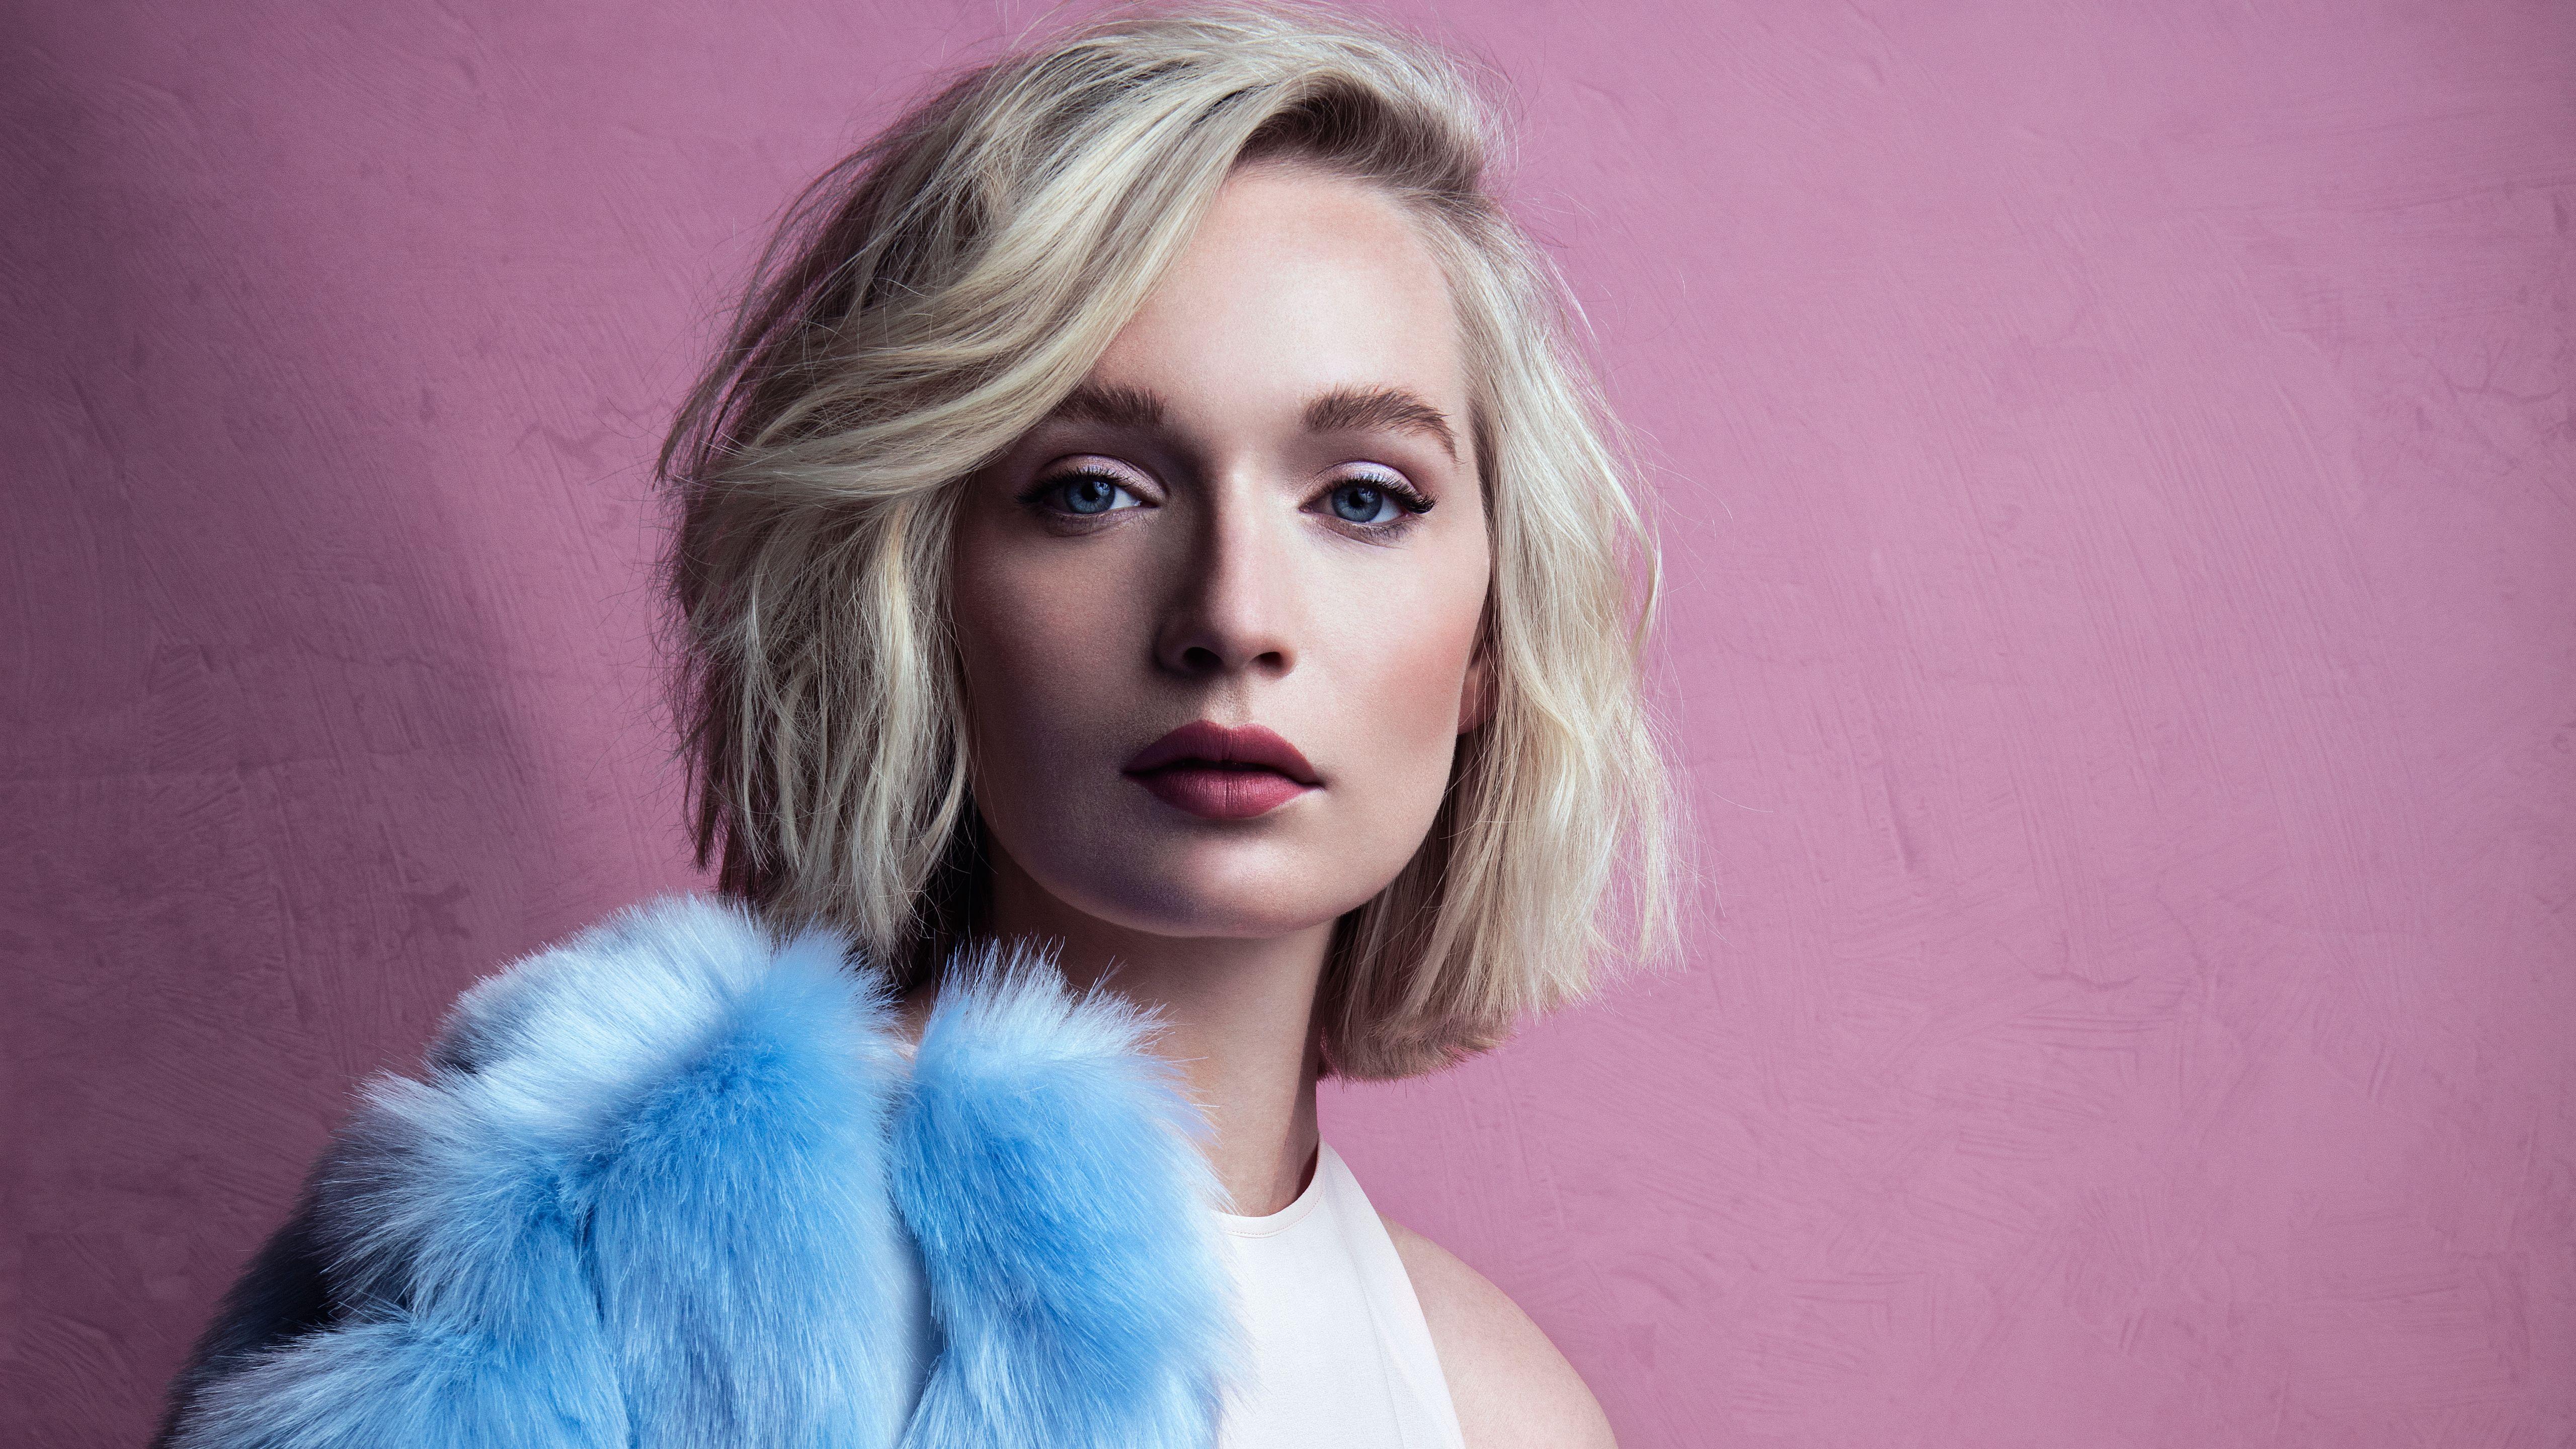 Model blond 2018